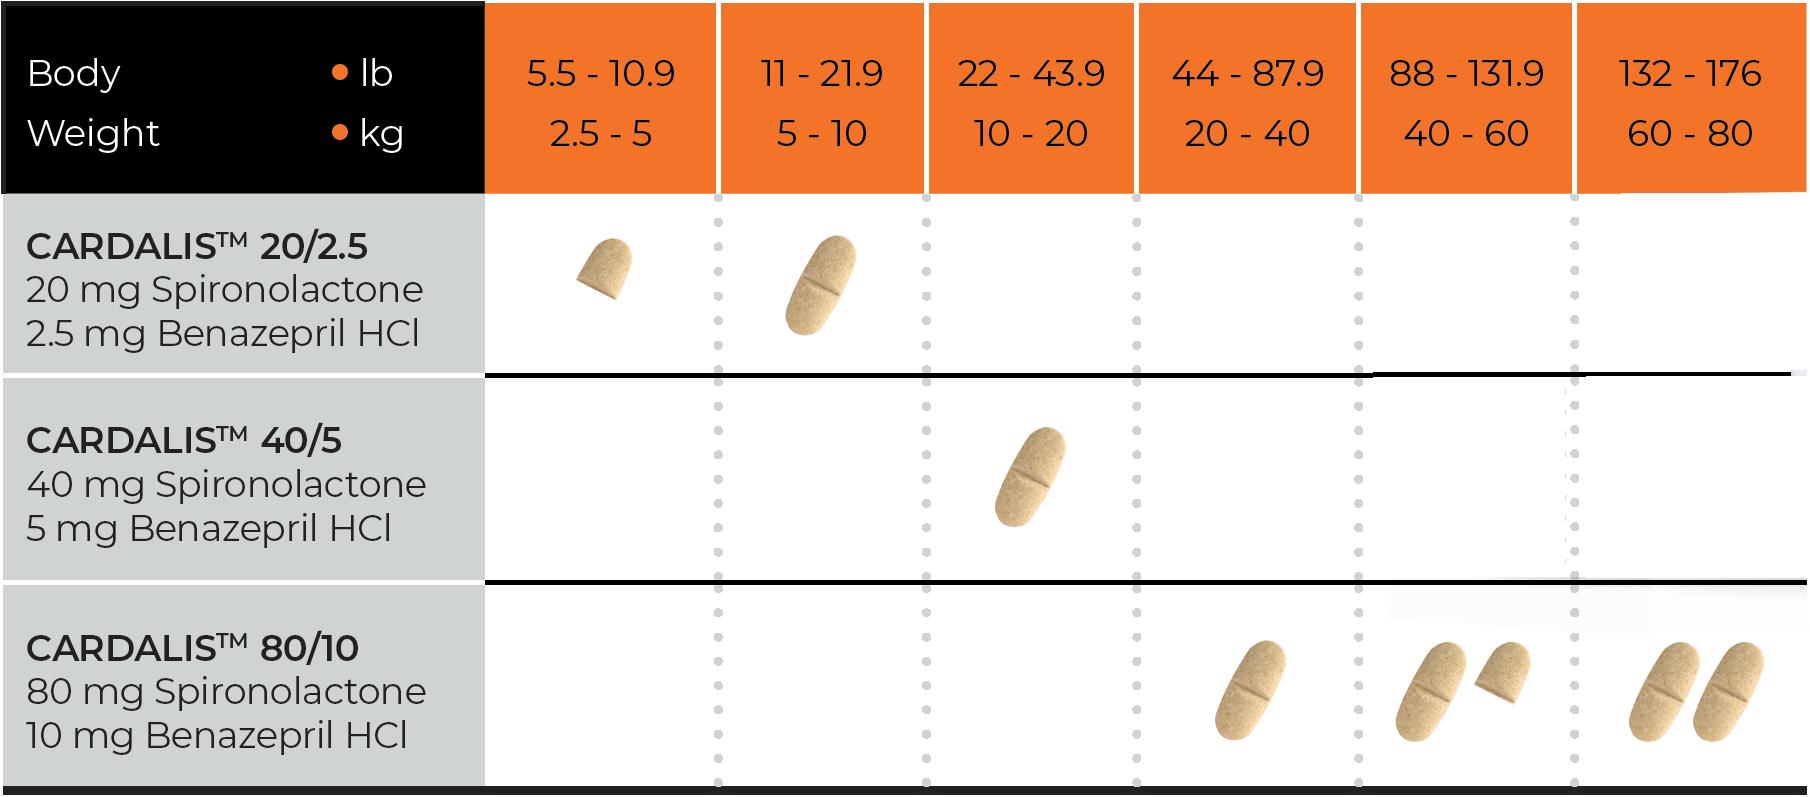 cardalis-dosage-chart